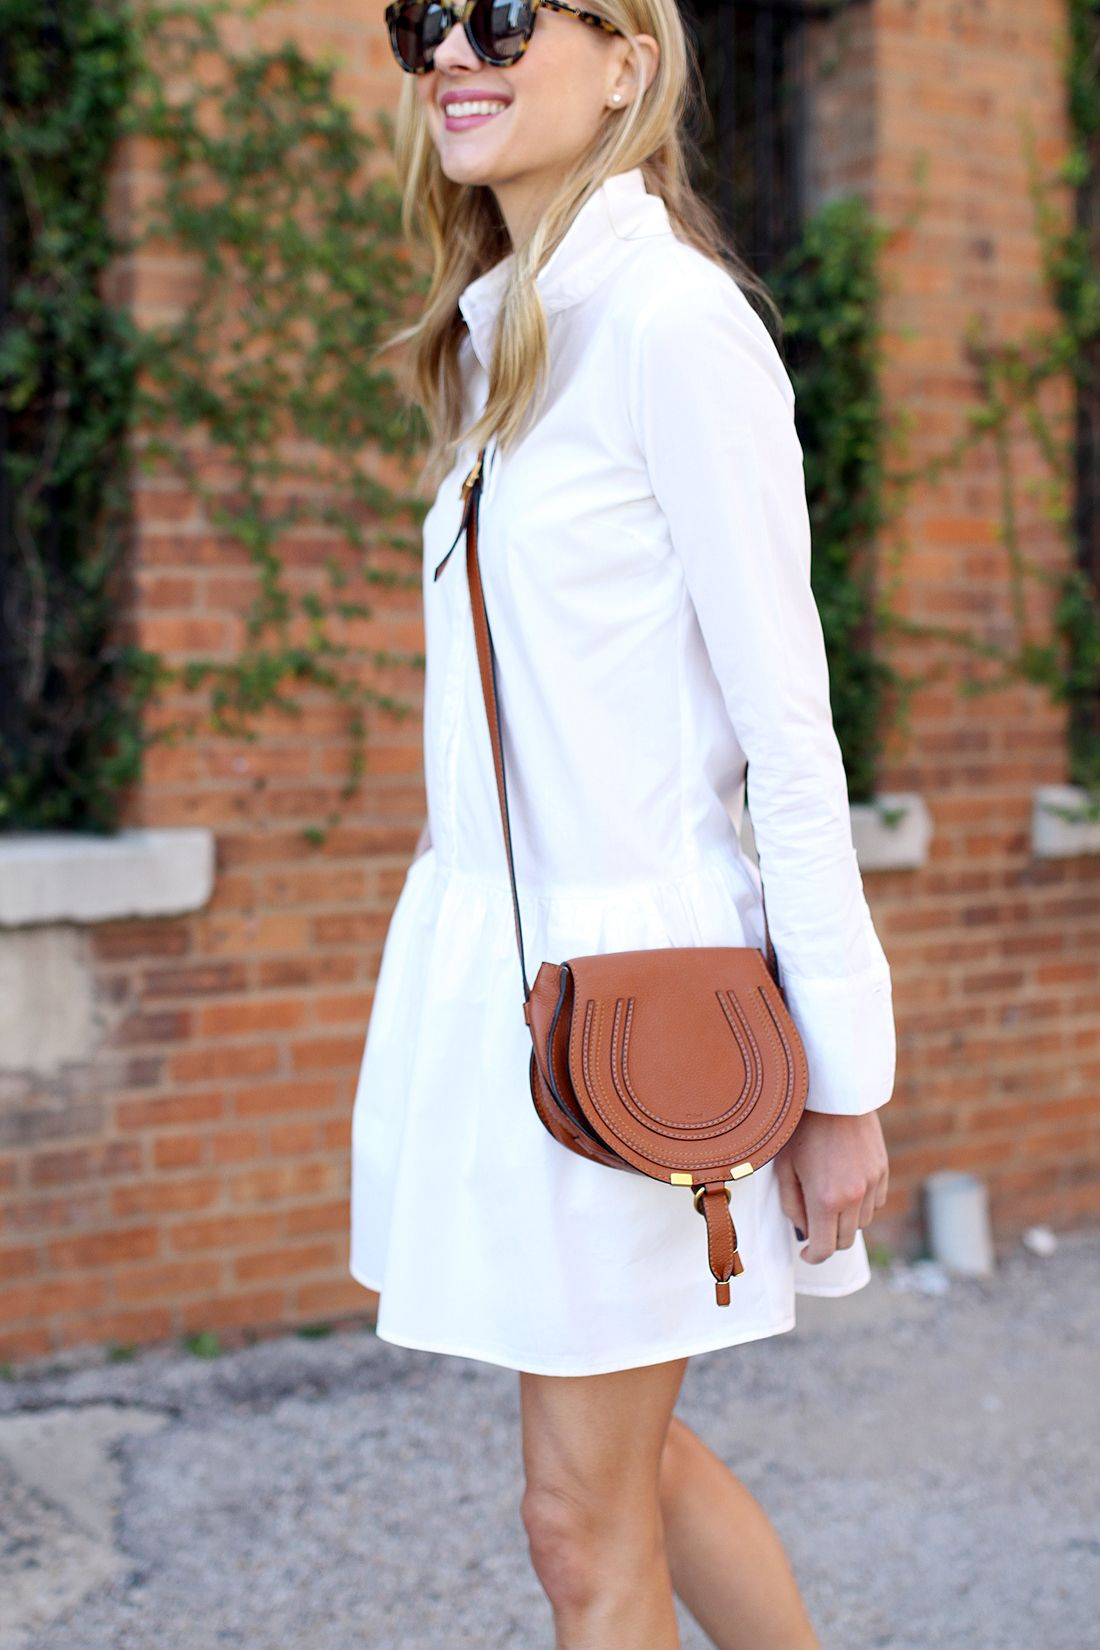 fashion-jackson-splendid-damsel-white -shirt-dress-chloe-marcie-tan-crossbody-karen-walker-sunglasses   chloefashion  splendidla 471b1dfe4